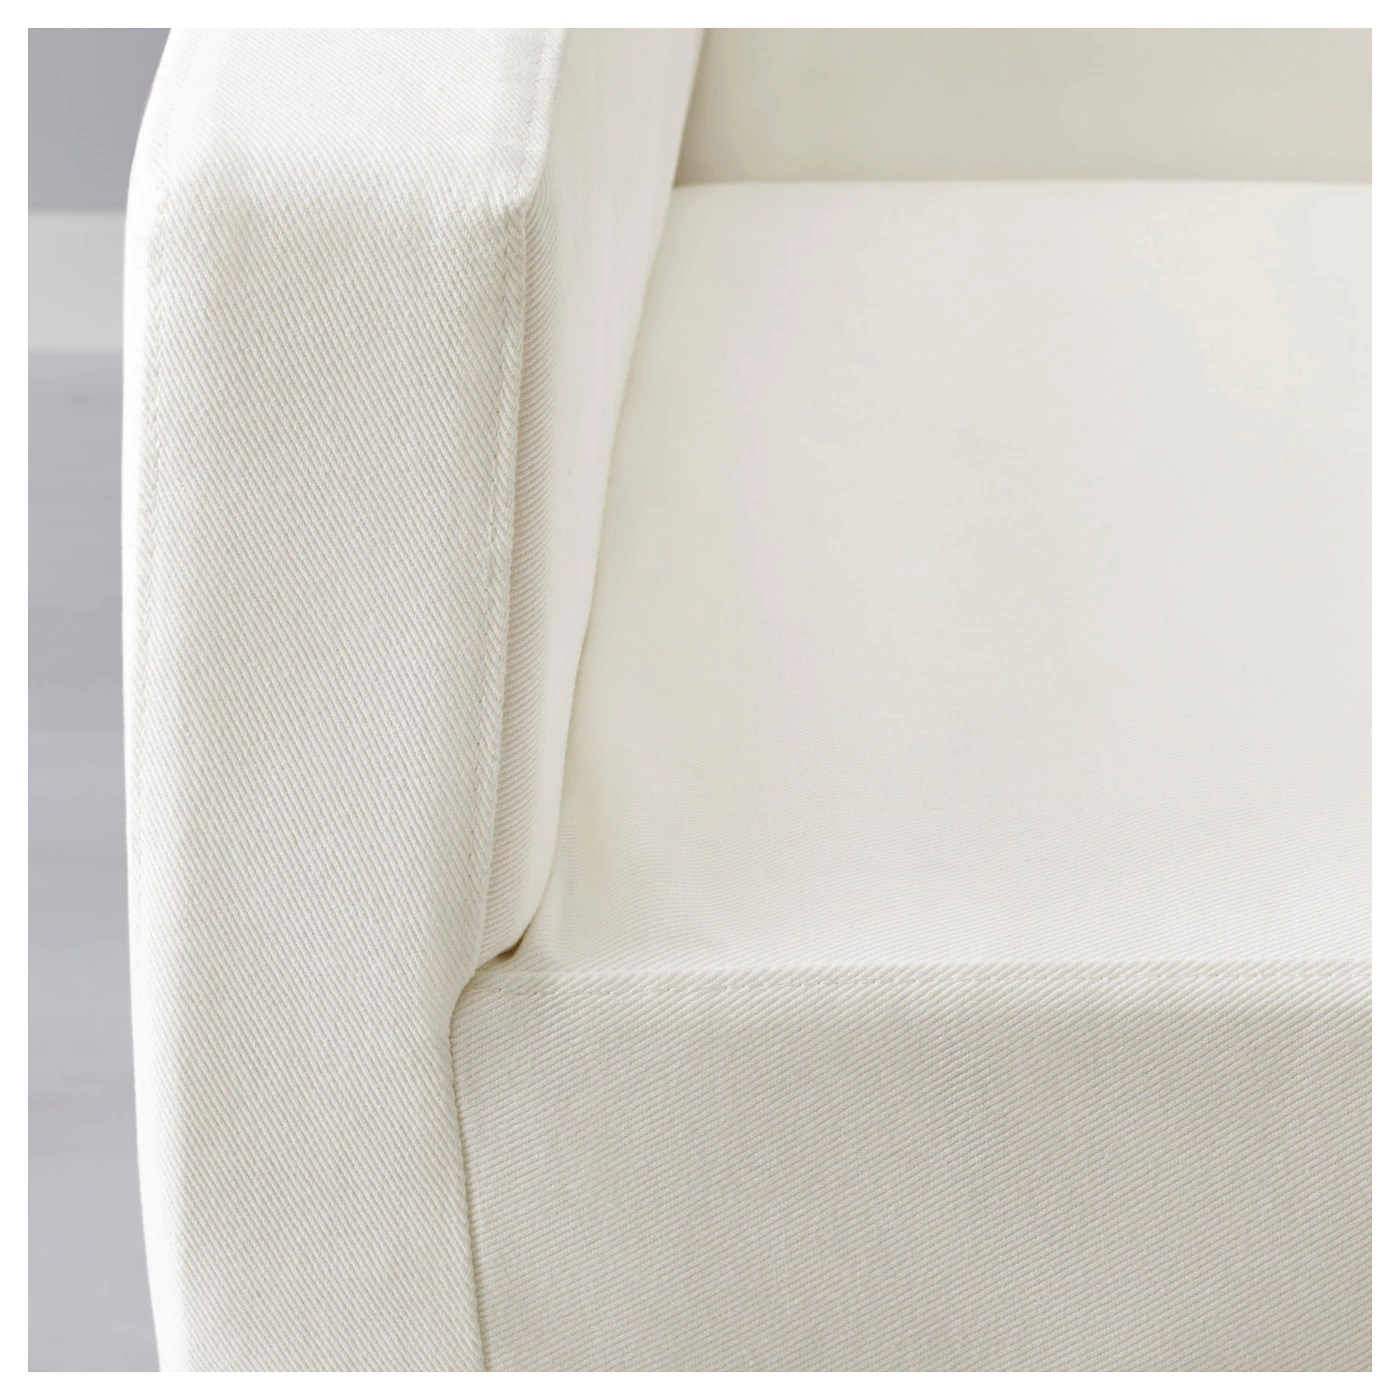 ikea nils chair covers uk revolving with armrests black blekinge white